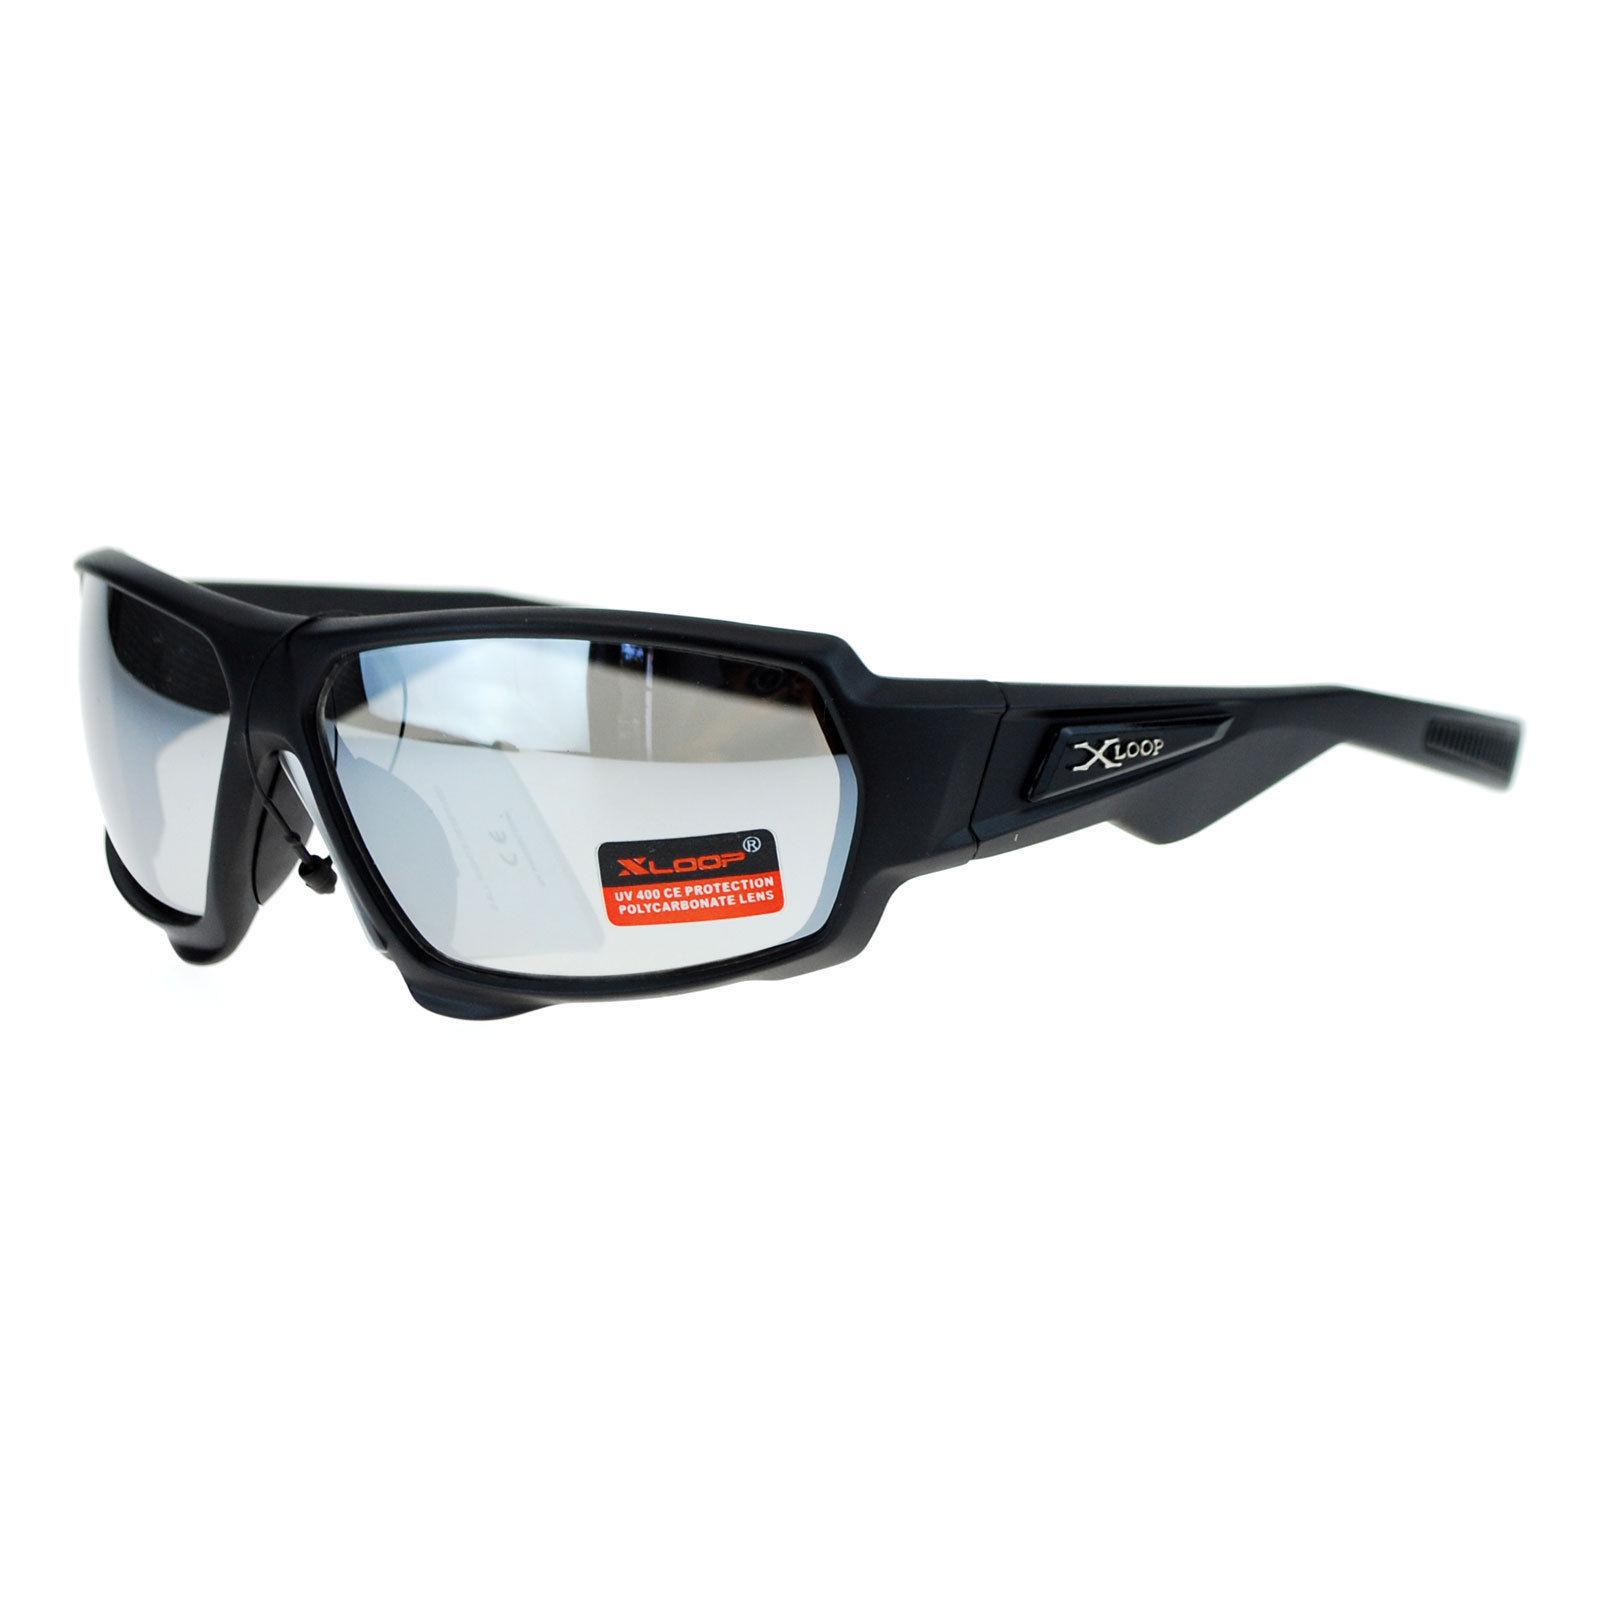 Xloop Mens Sunglasses Matted Rectangular Wrap Around Sports Fashion